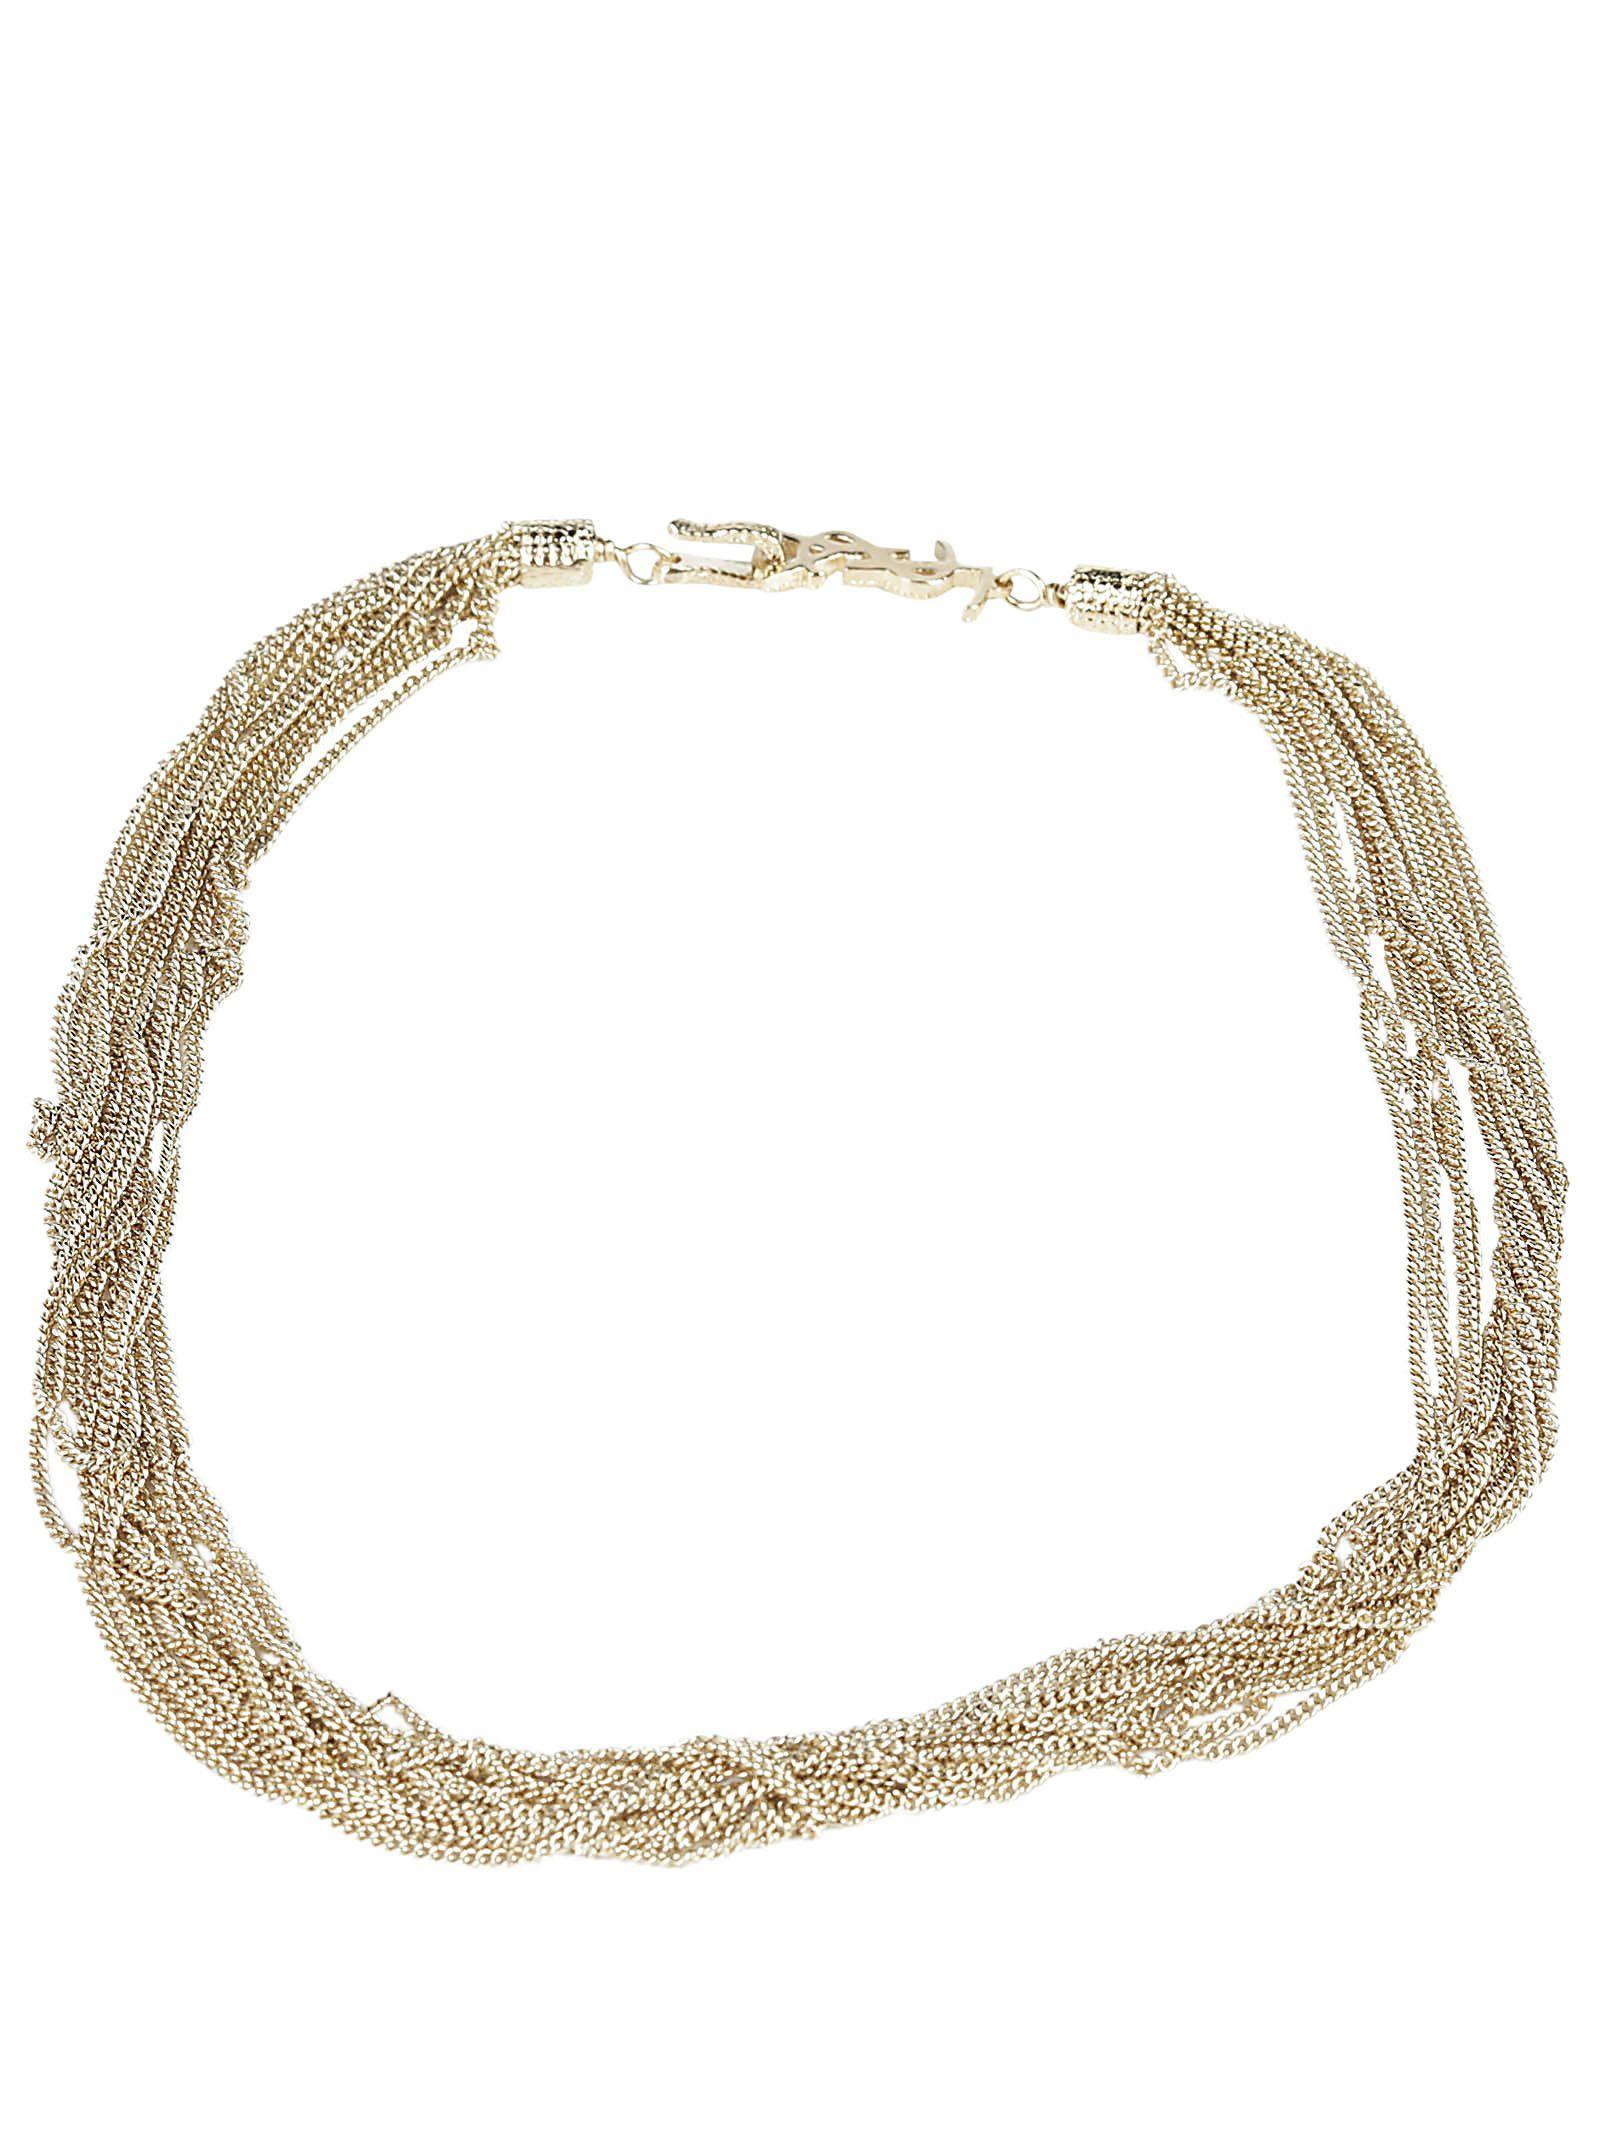 saint laurent necklace dore clair 10675609 italist. Black Bedroom Furniture Sets. Home Design Ideas